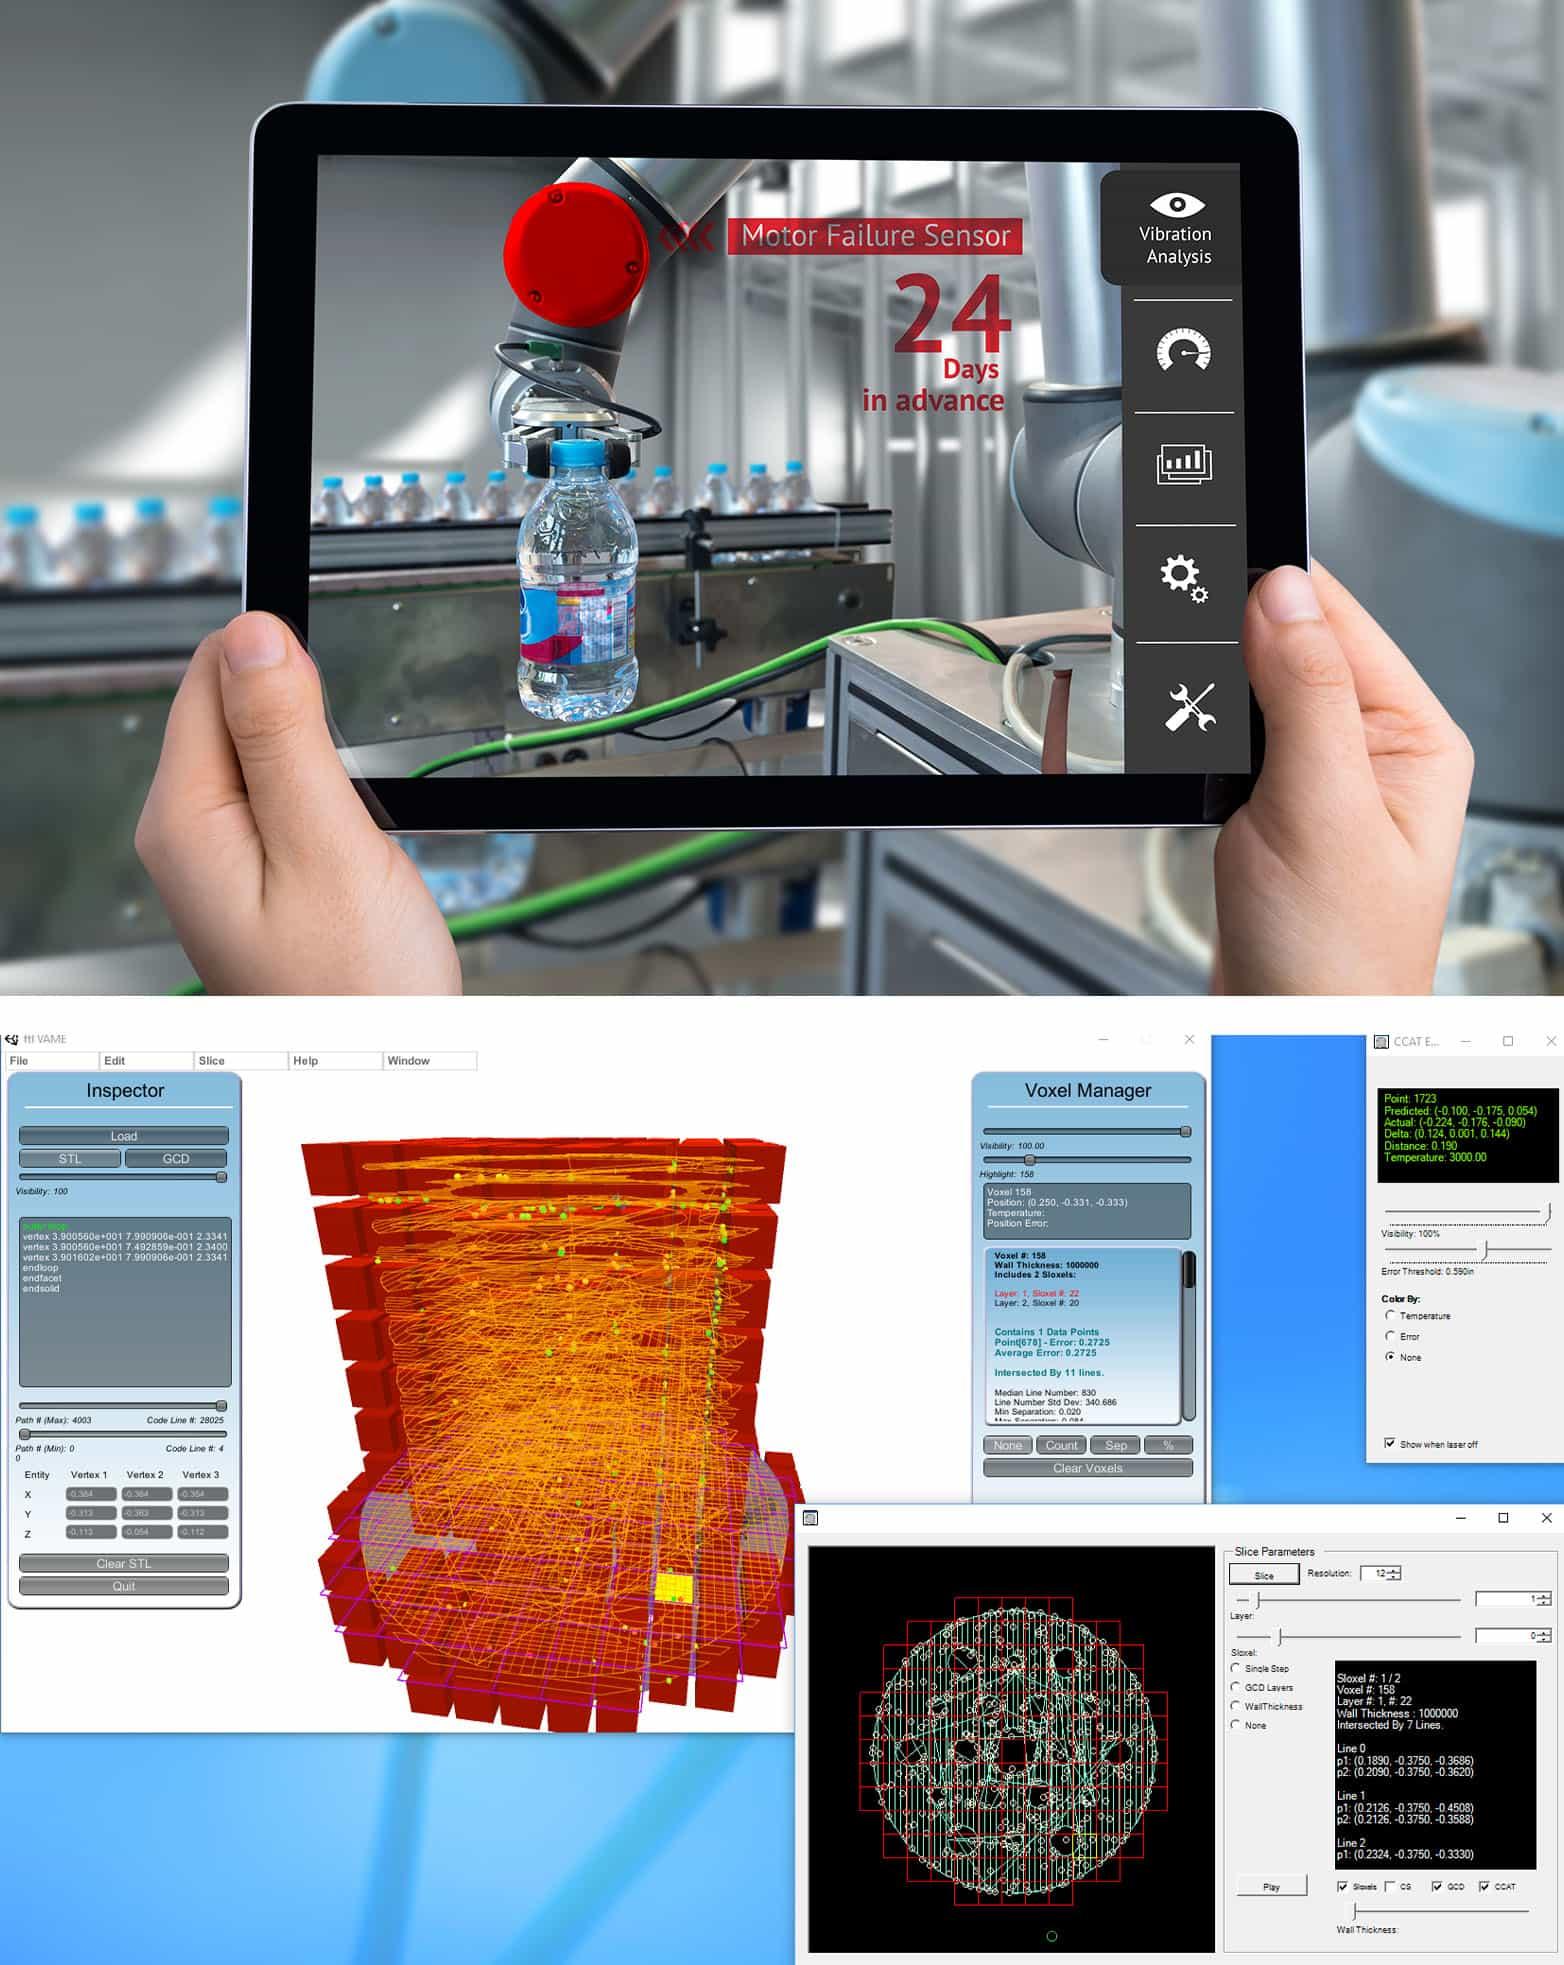 An image of an iPad mockup where the iPad is displaying a DADTMA experimentation